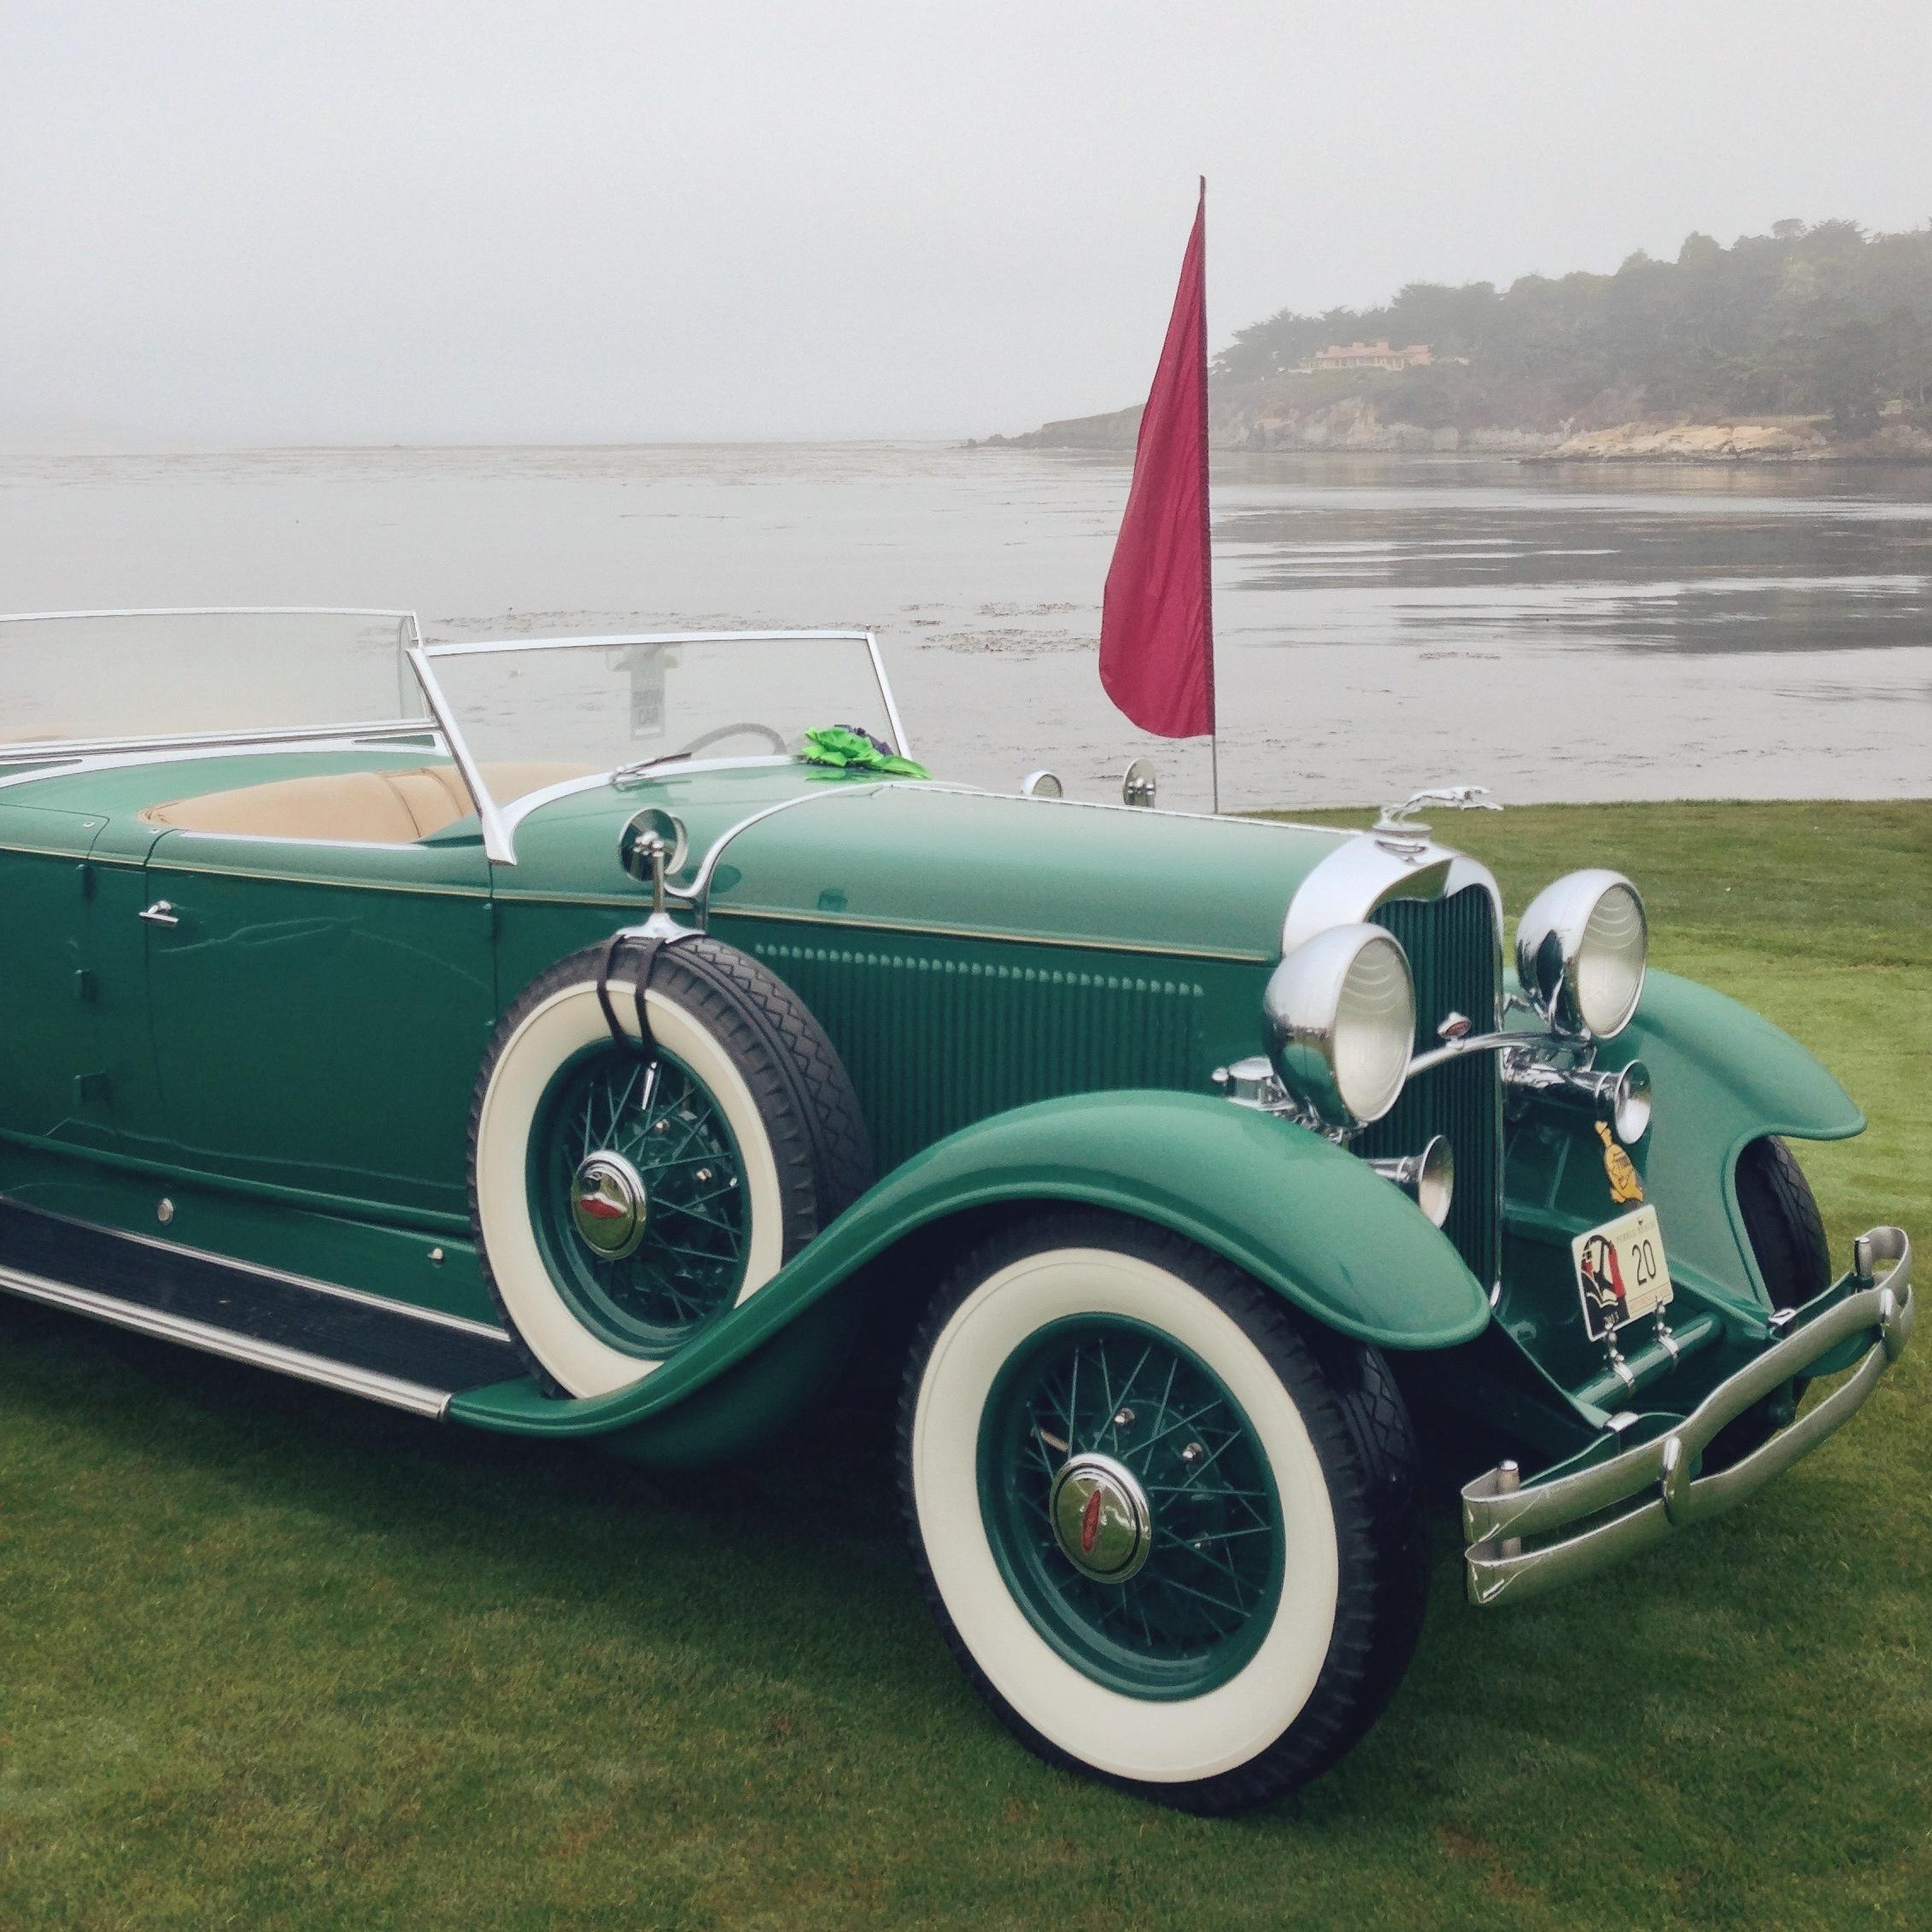 1930 Lincoln Model L Judkins Coupe, shot by Ben Heath